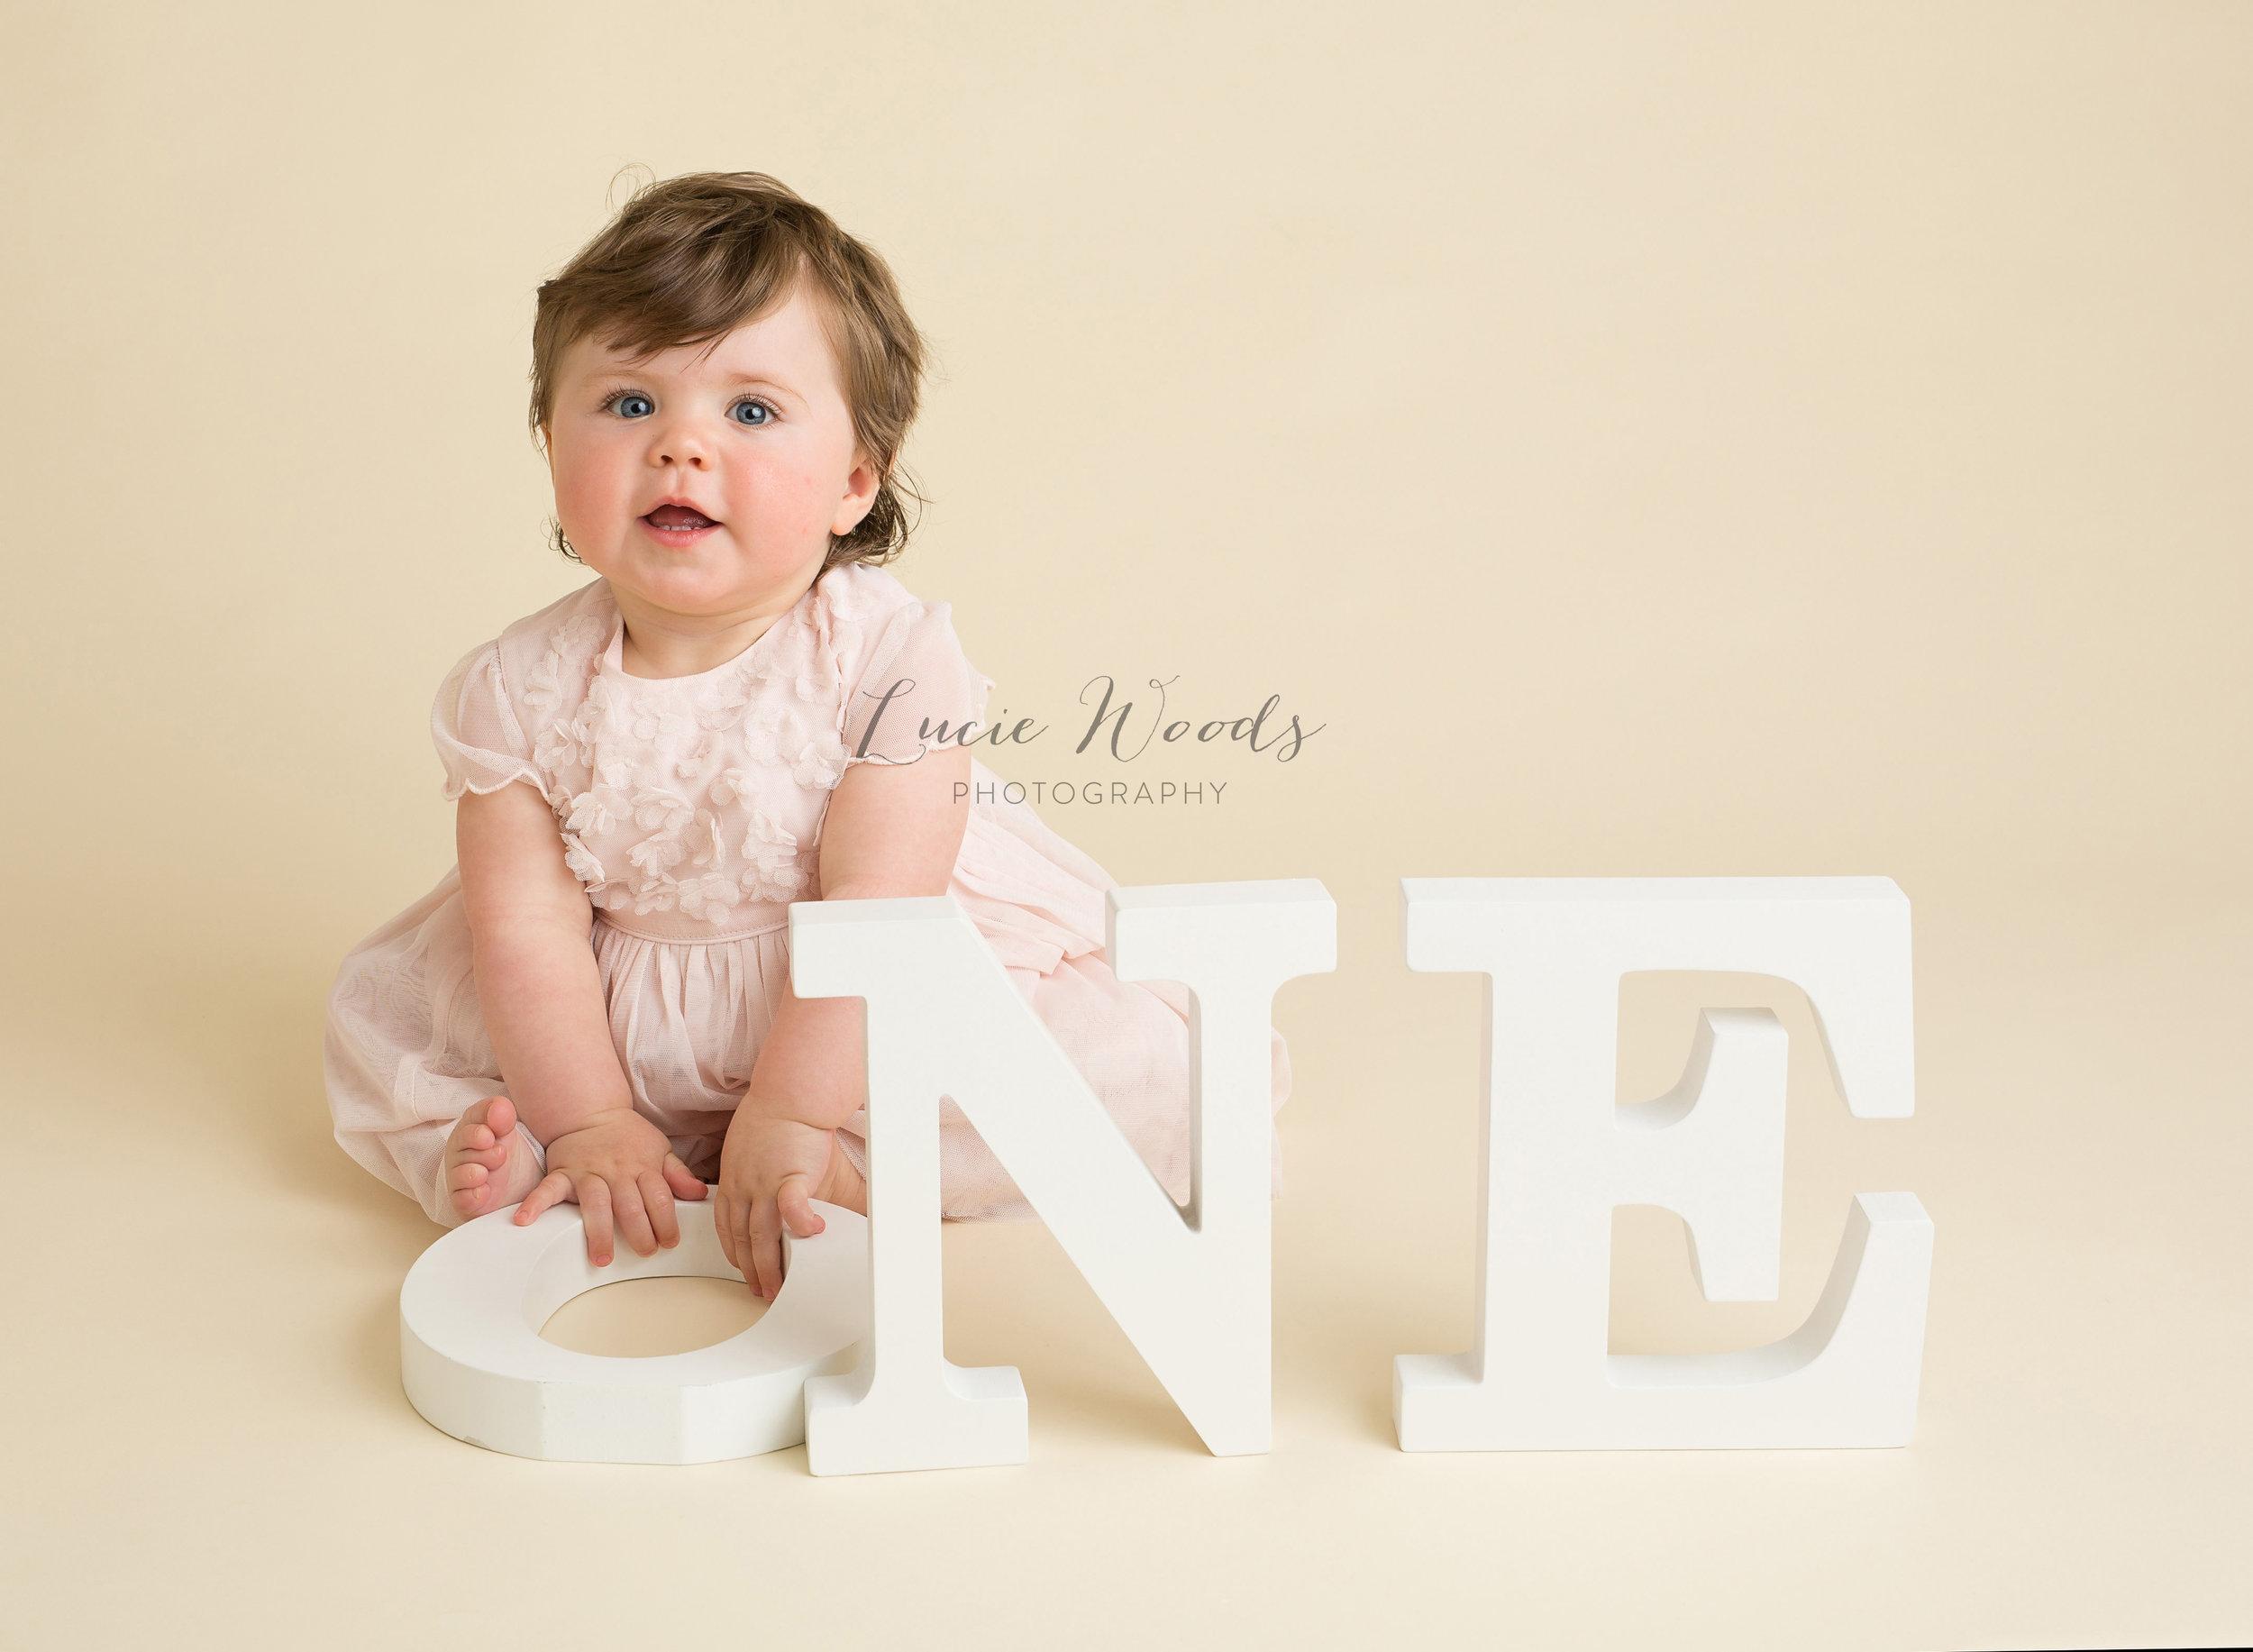 Newborn photographer baby photos photo Manchester Lancashire Rawtenstall Lucie Woods Photography cake smash milestones